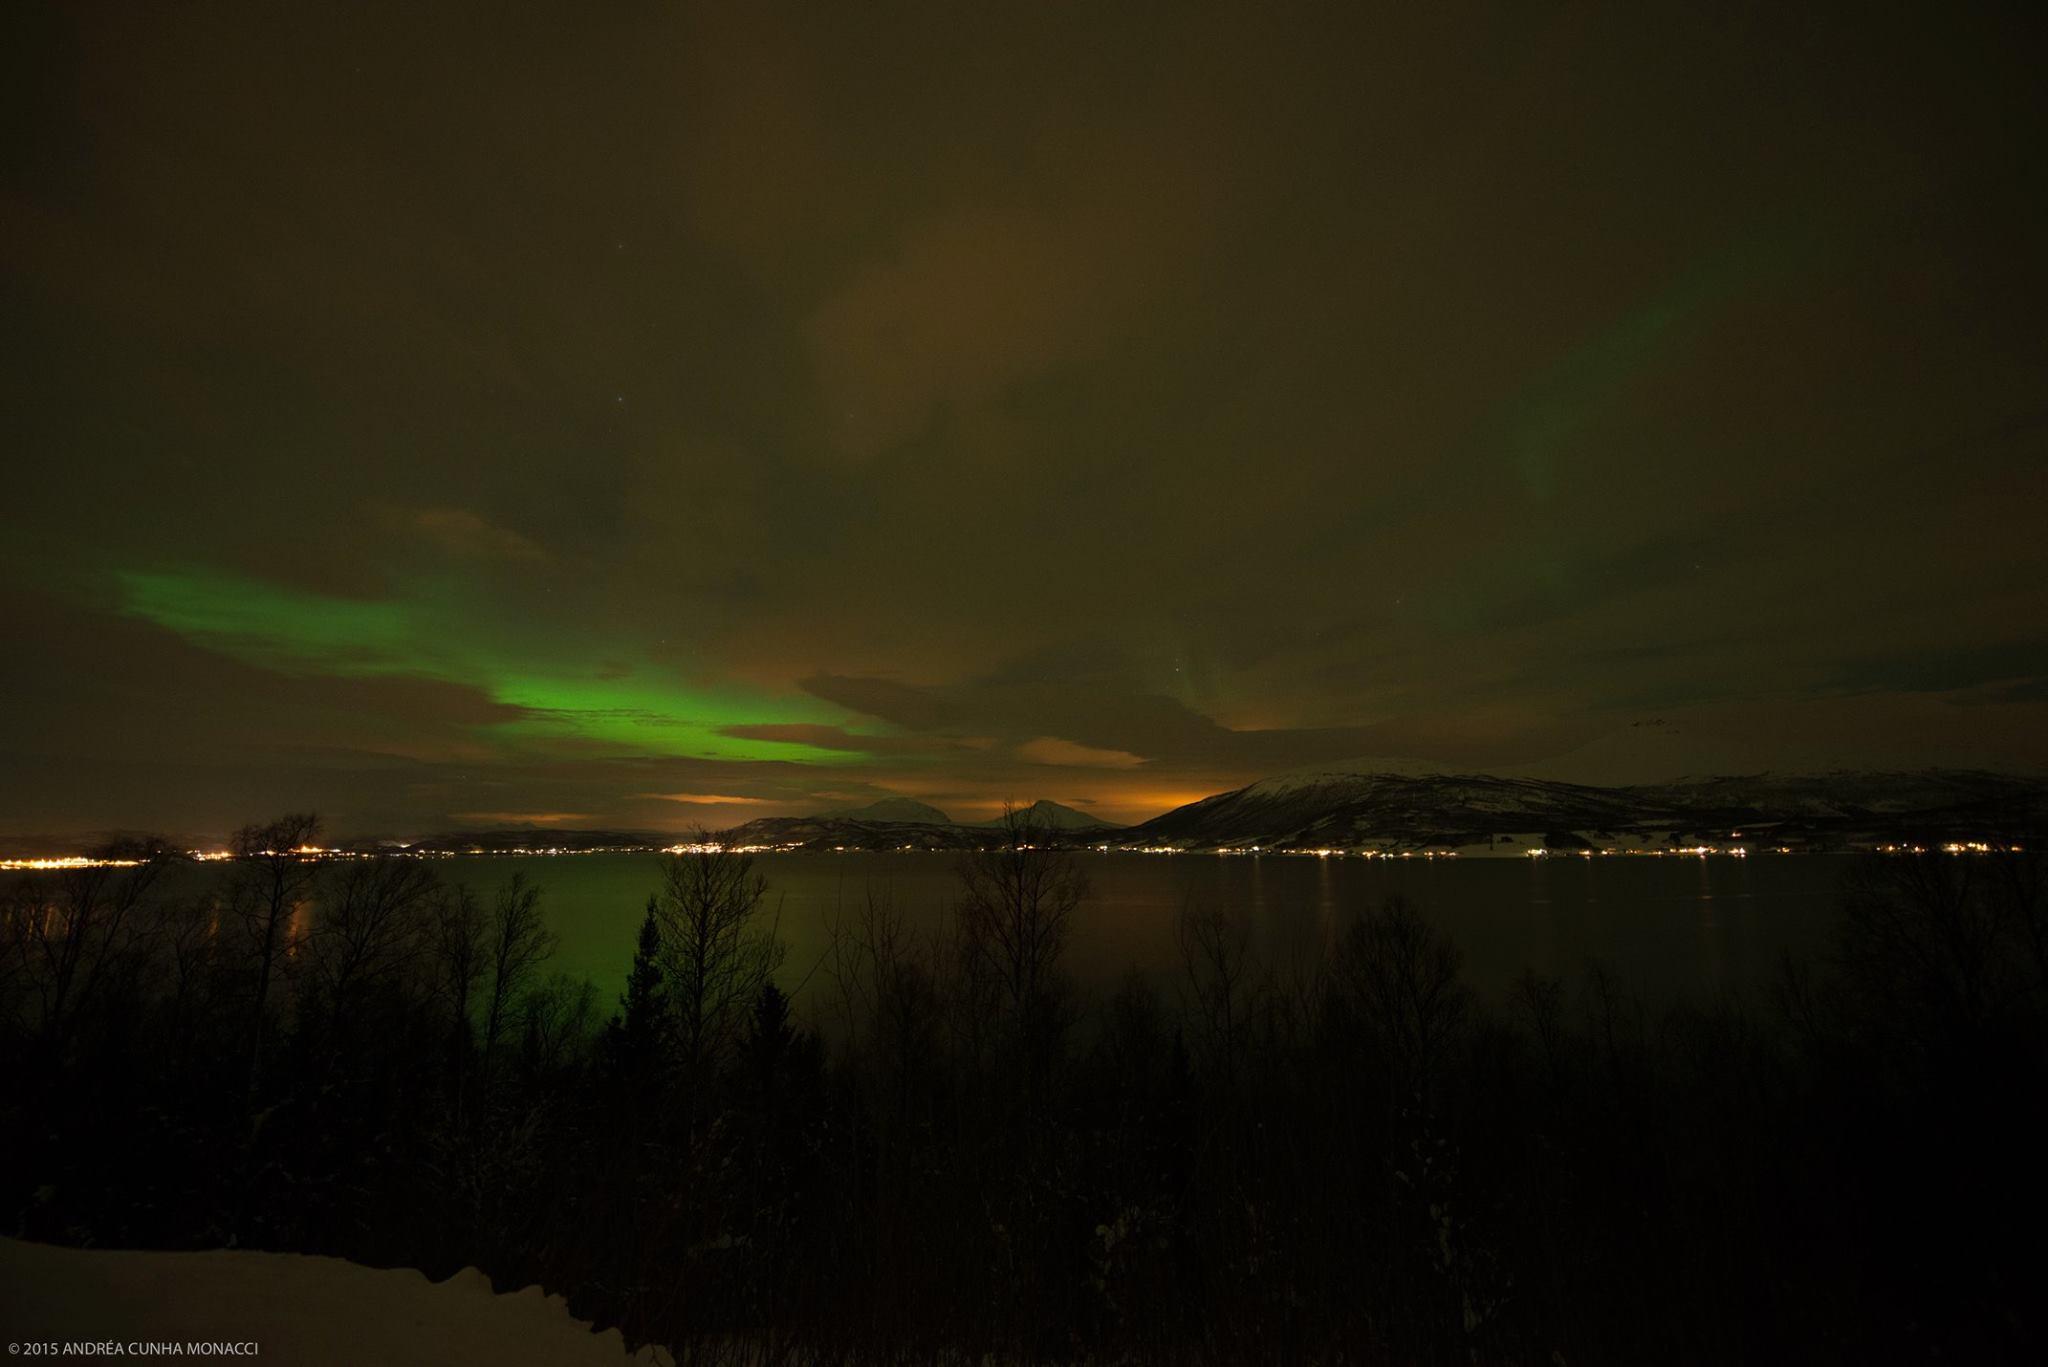 Andrea Monacci , mostrando seu talento já na priemira noite de caçada a Aurora Boreal. Madrugada deliciosa nos fjords da Noruega.